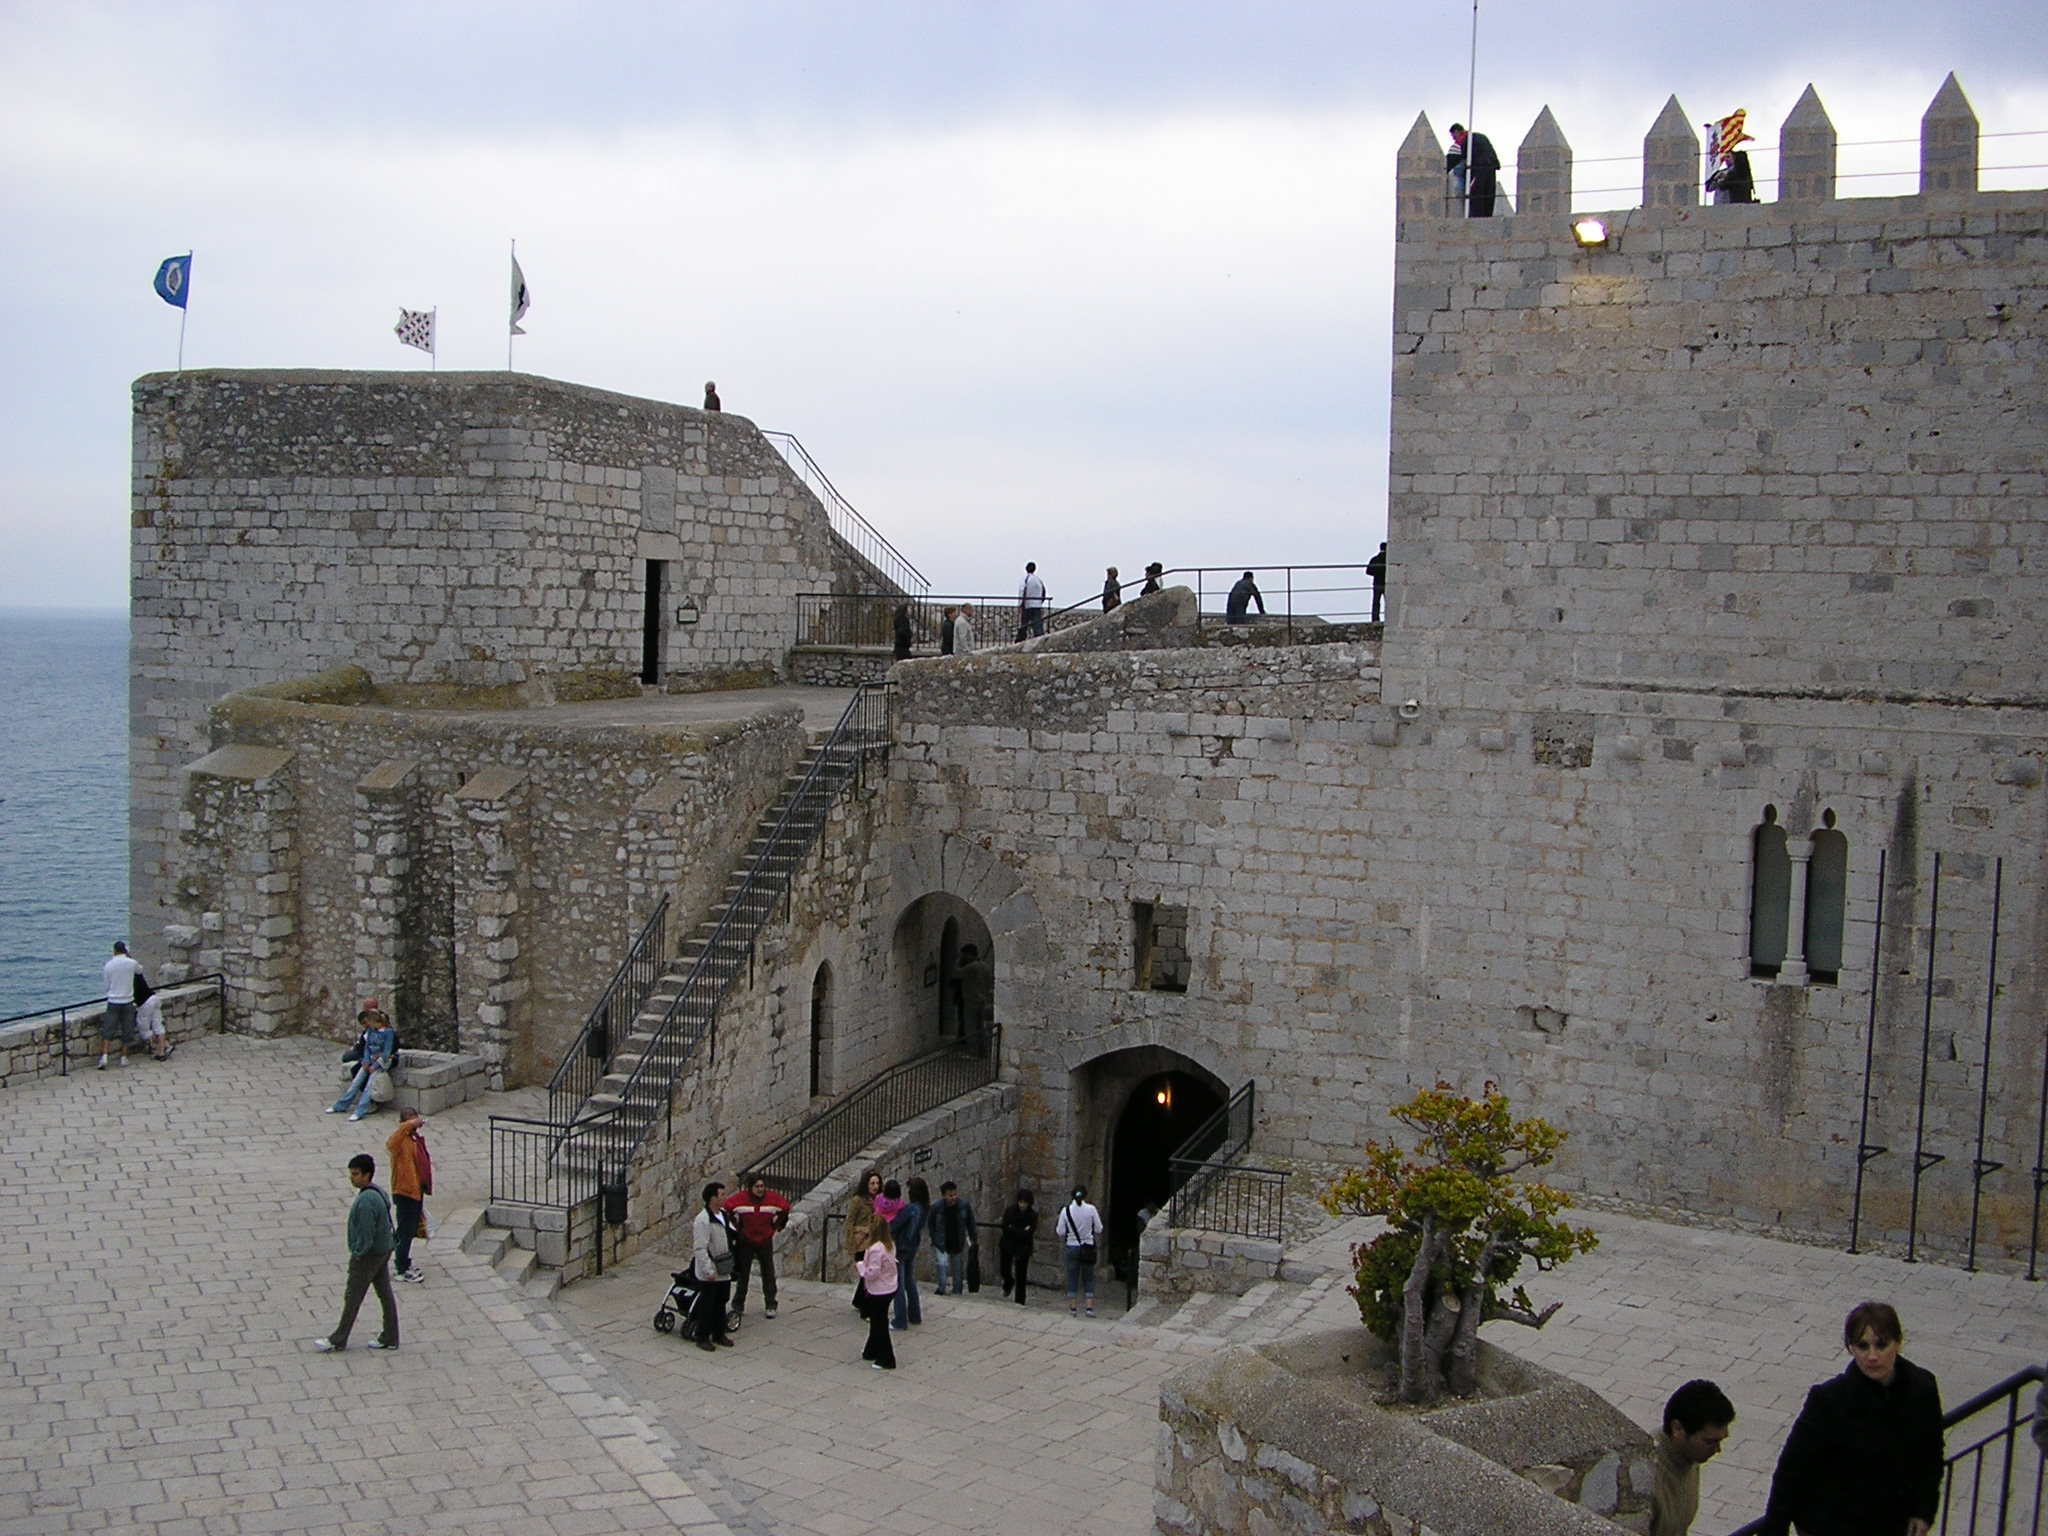 Castelo de Peníscola